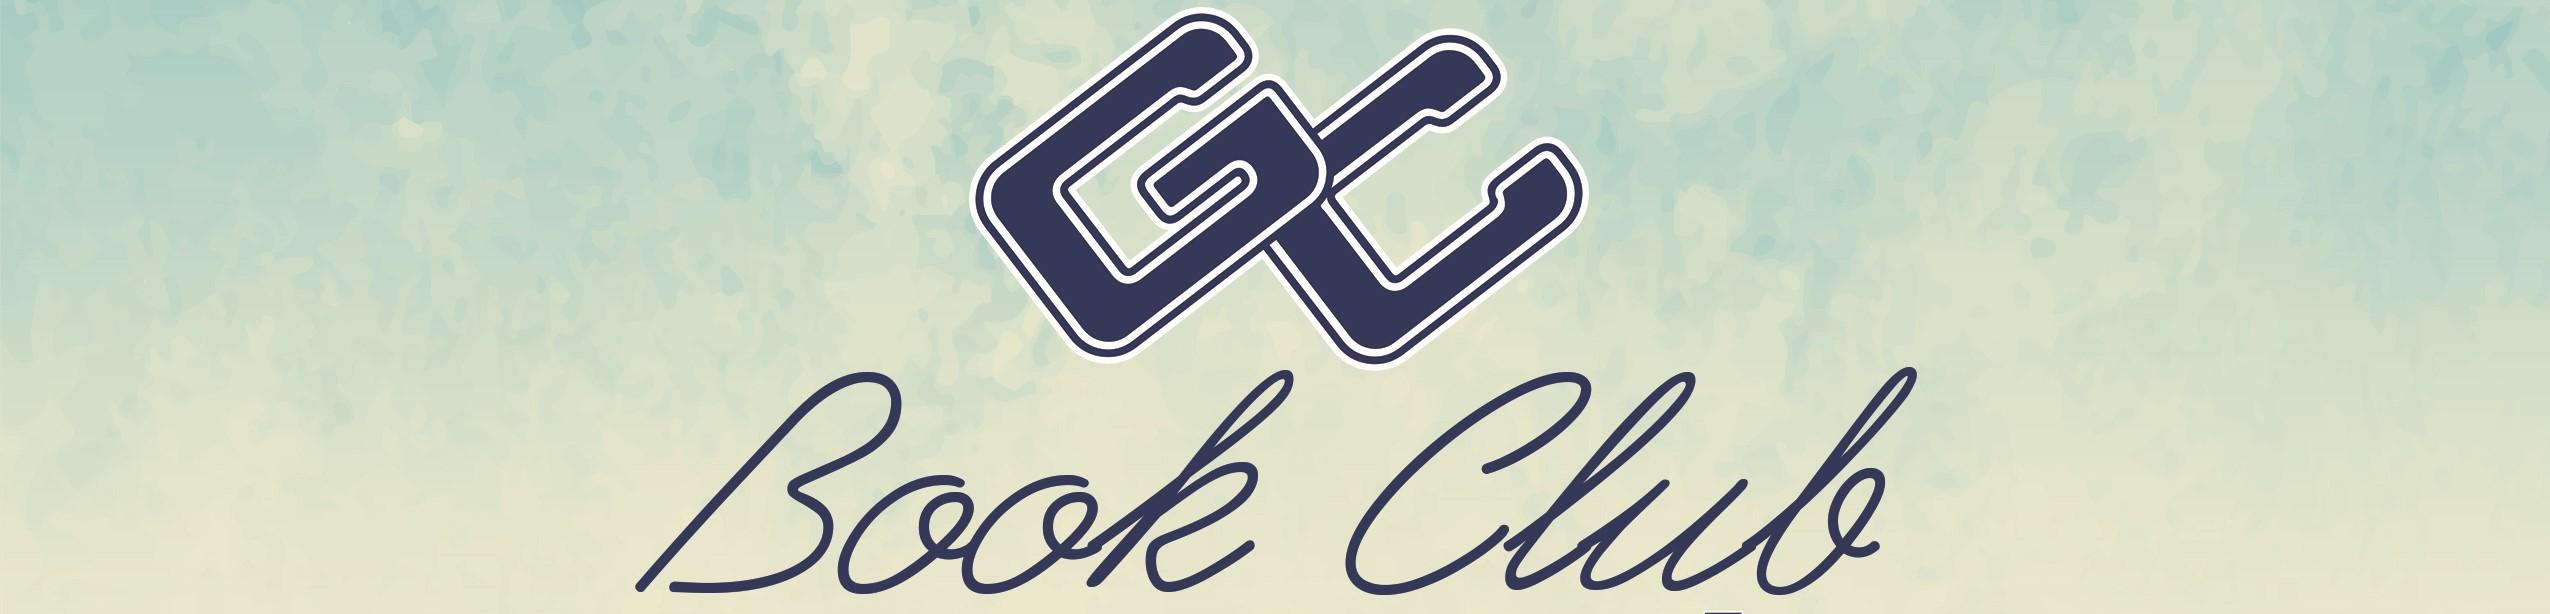 gc book club logo